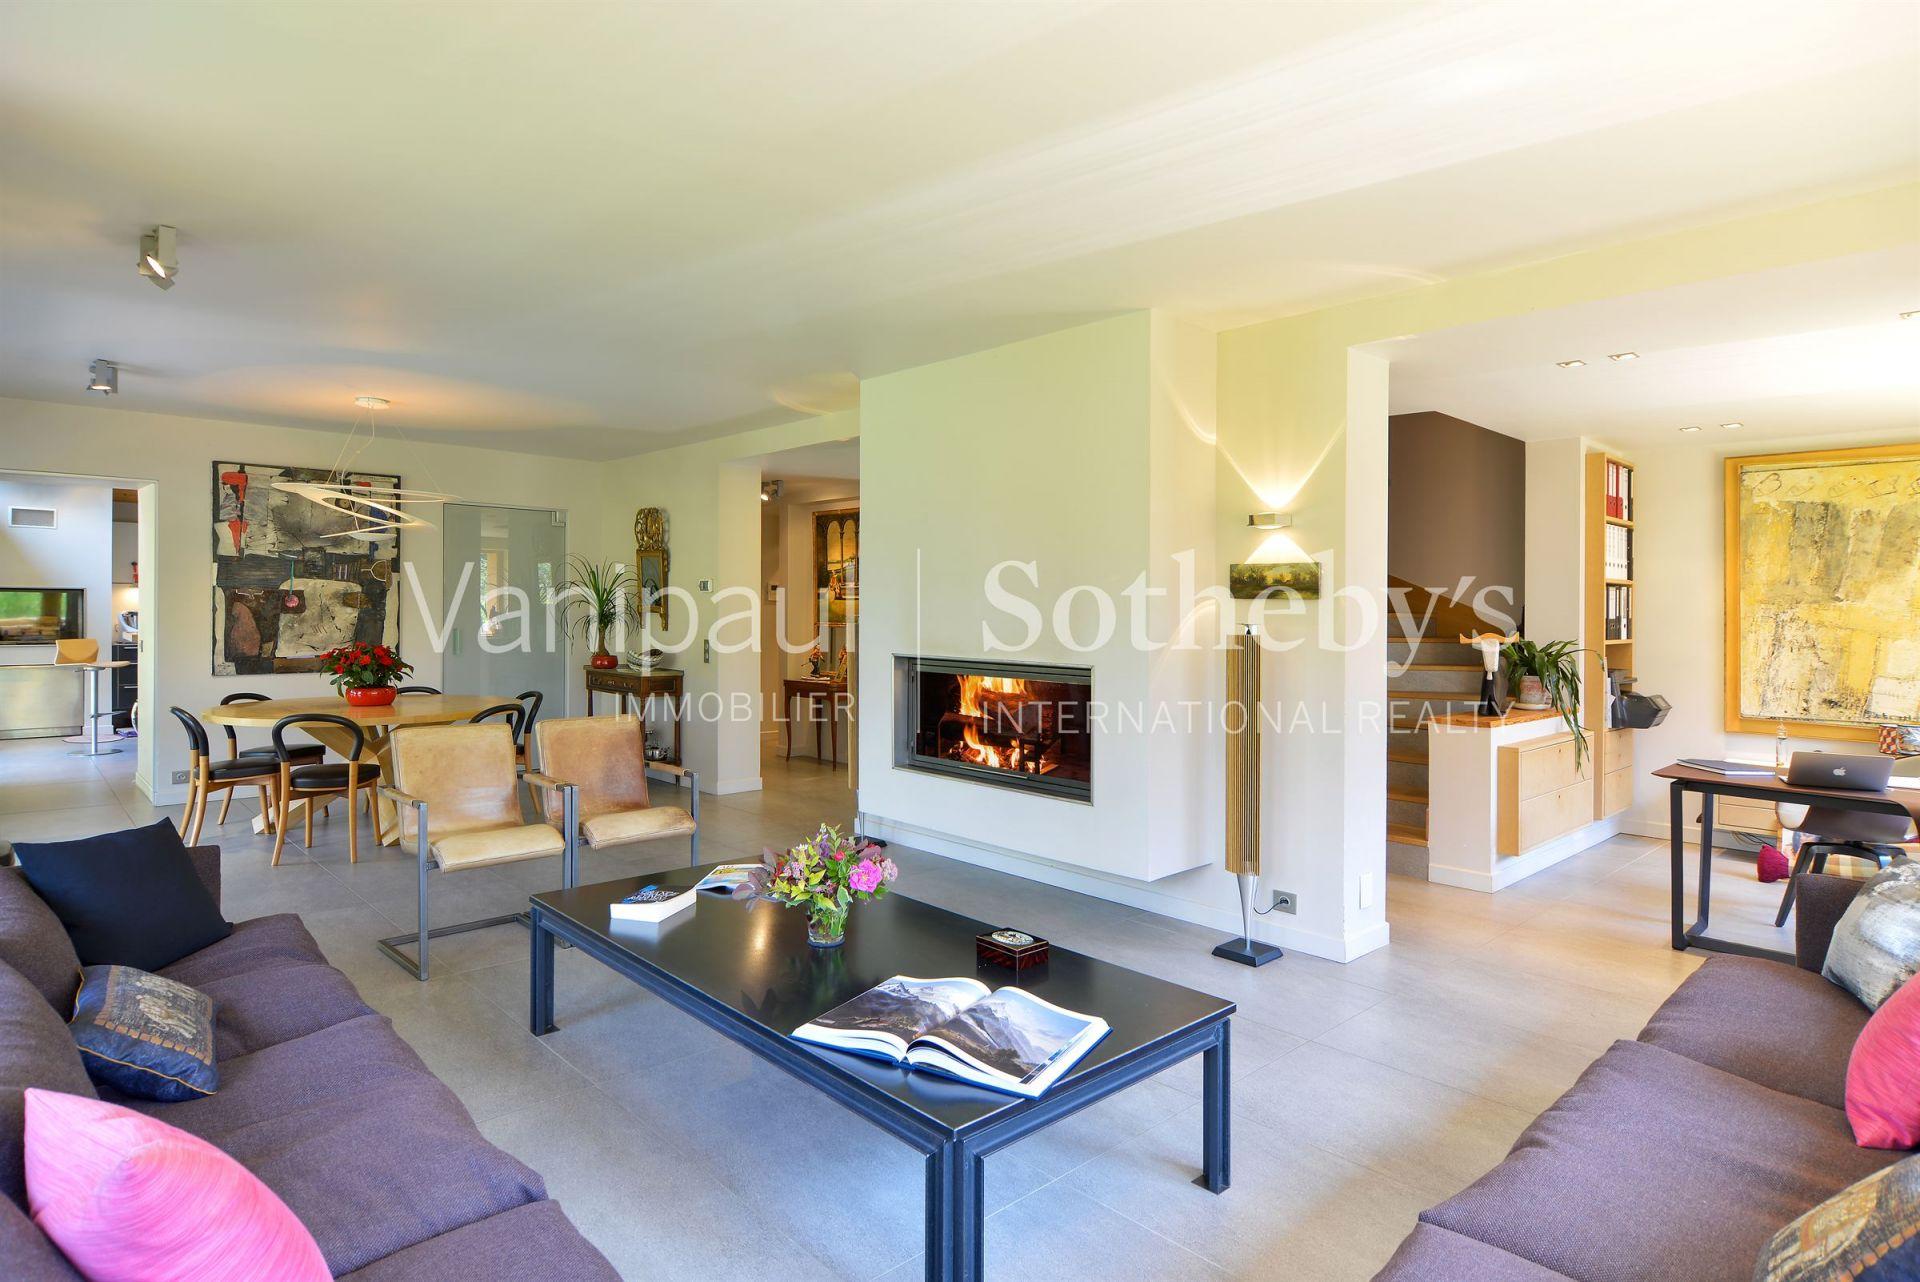 Sale Chalet Chamonix Mont Blanc 74400 Va2 030 Sotheby S  # Living Blanc